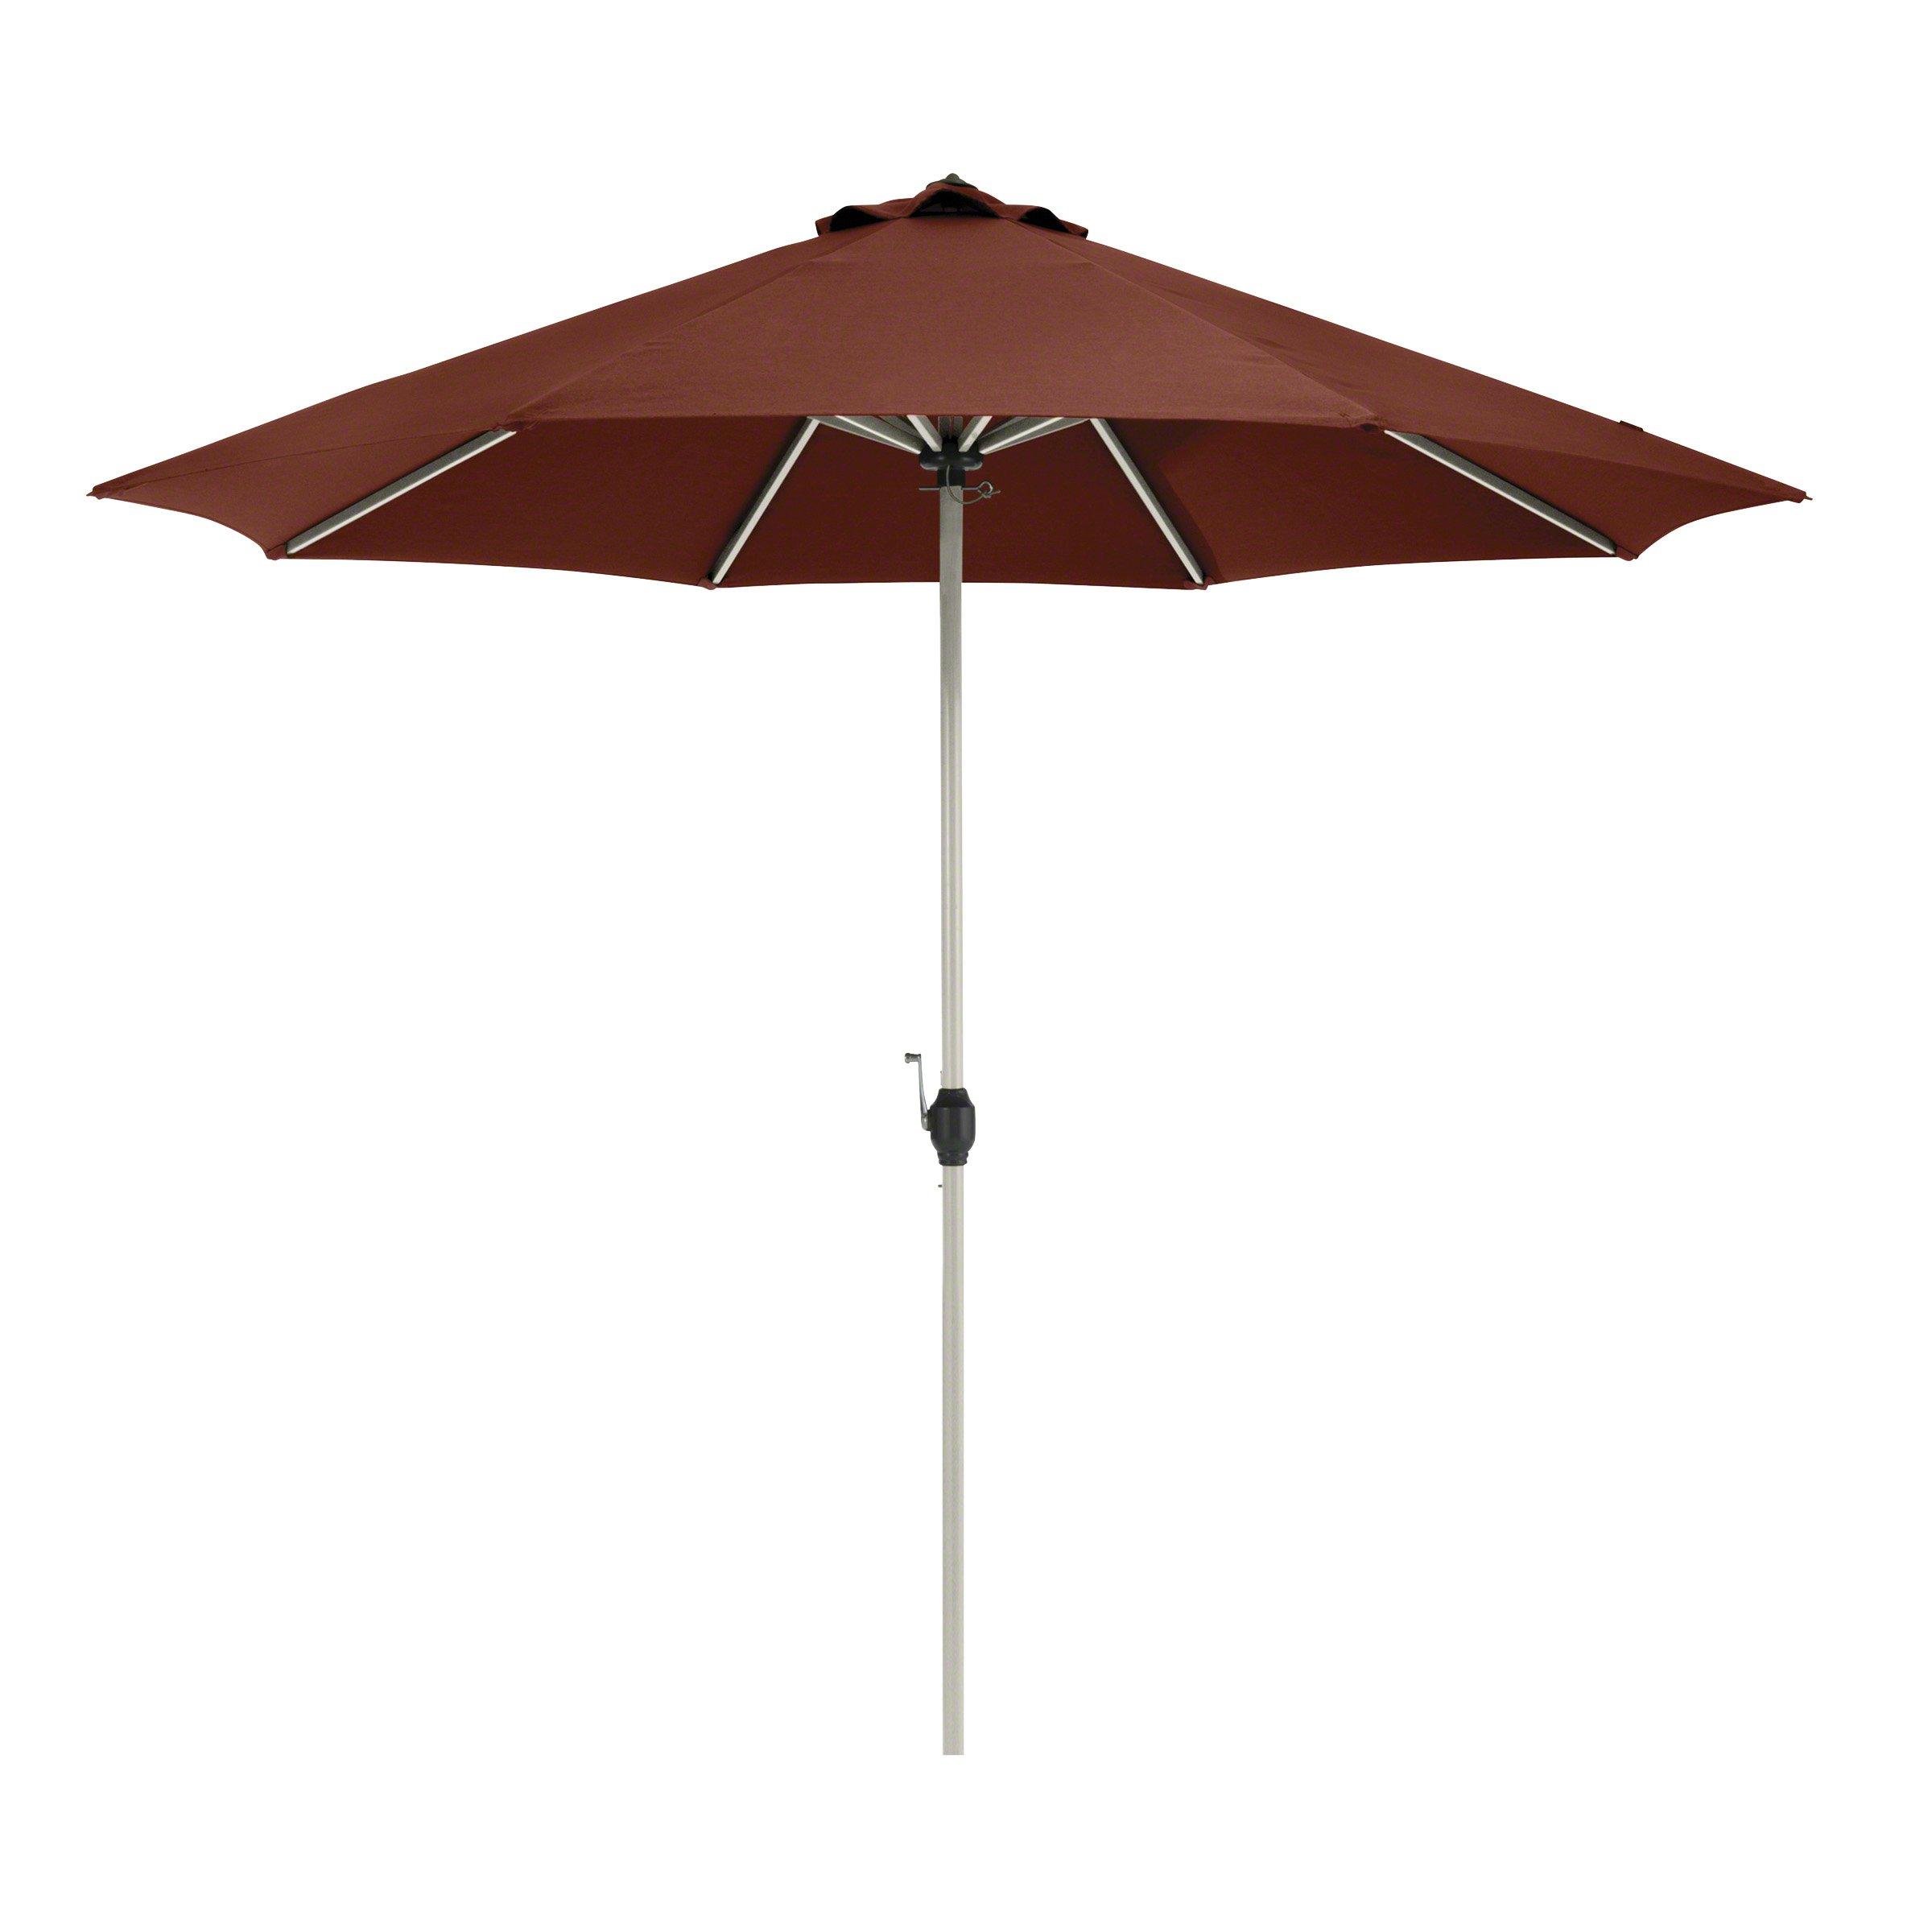 Classic Accessories Montlake FadeSafe 9-Foot Round Aluminum Patio Umbrella, Heather Henna